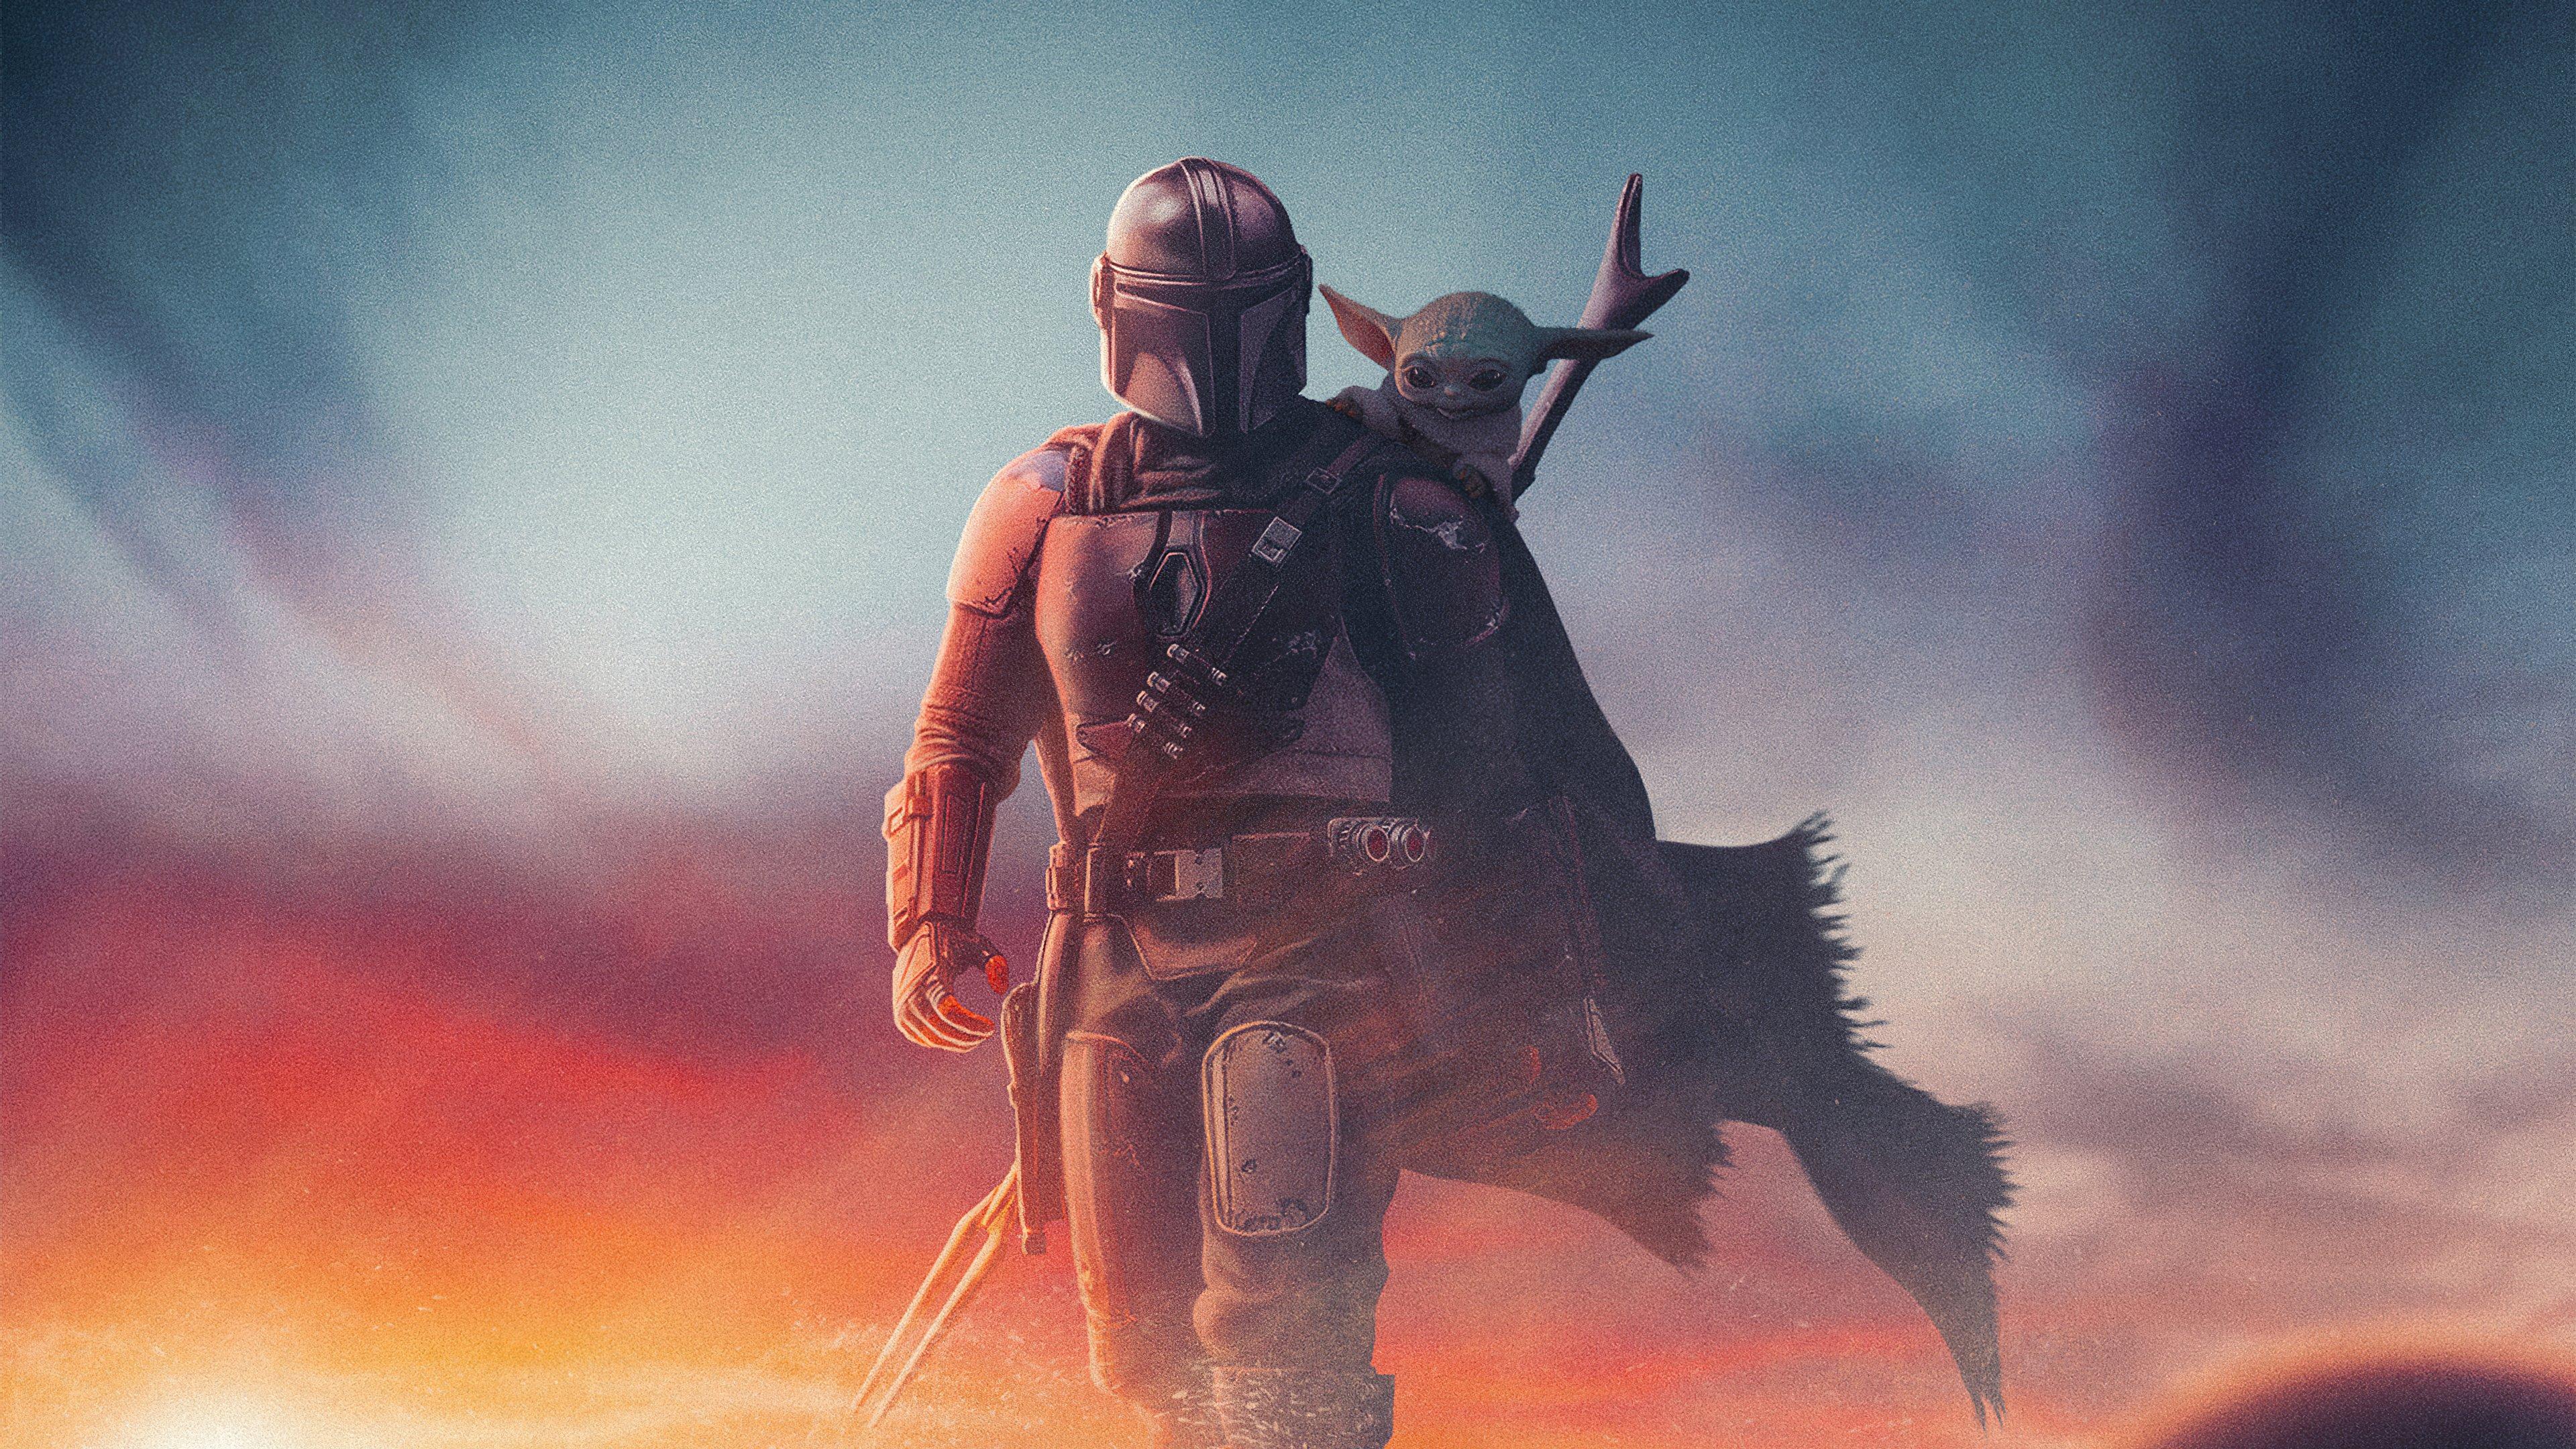 Fondos de pantalla The Mandalorian Yoda Artwork